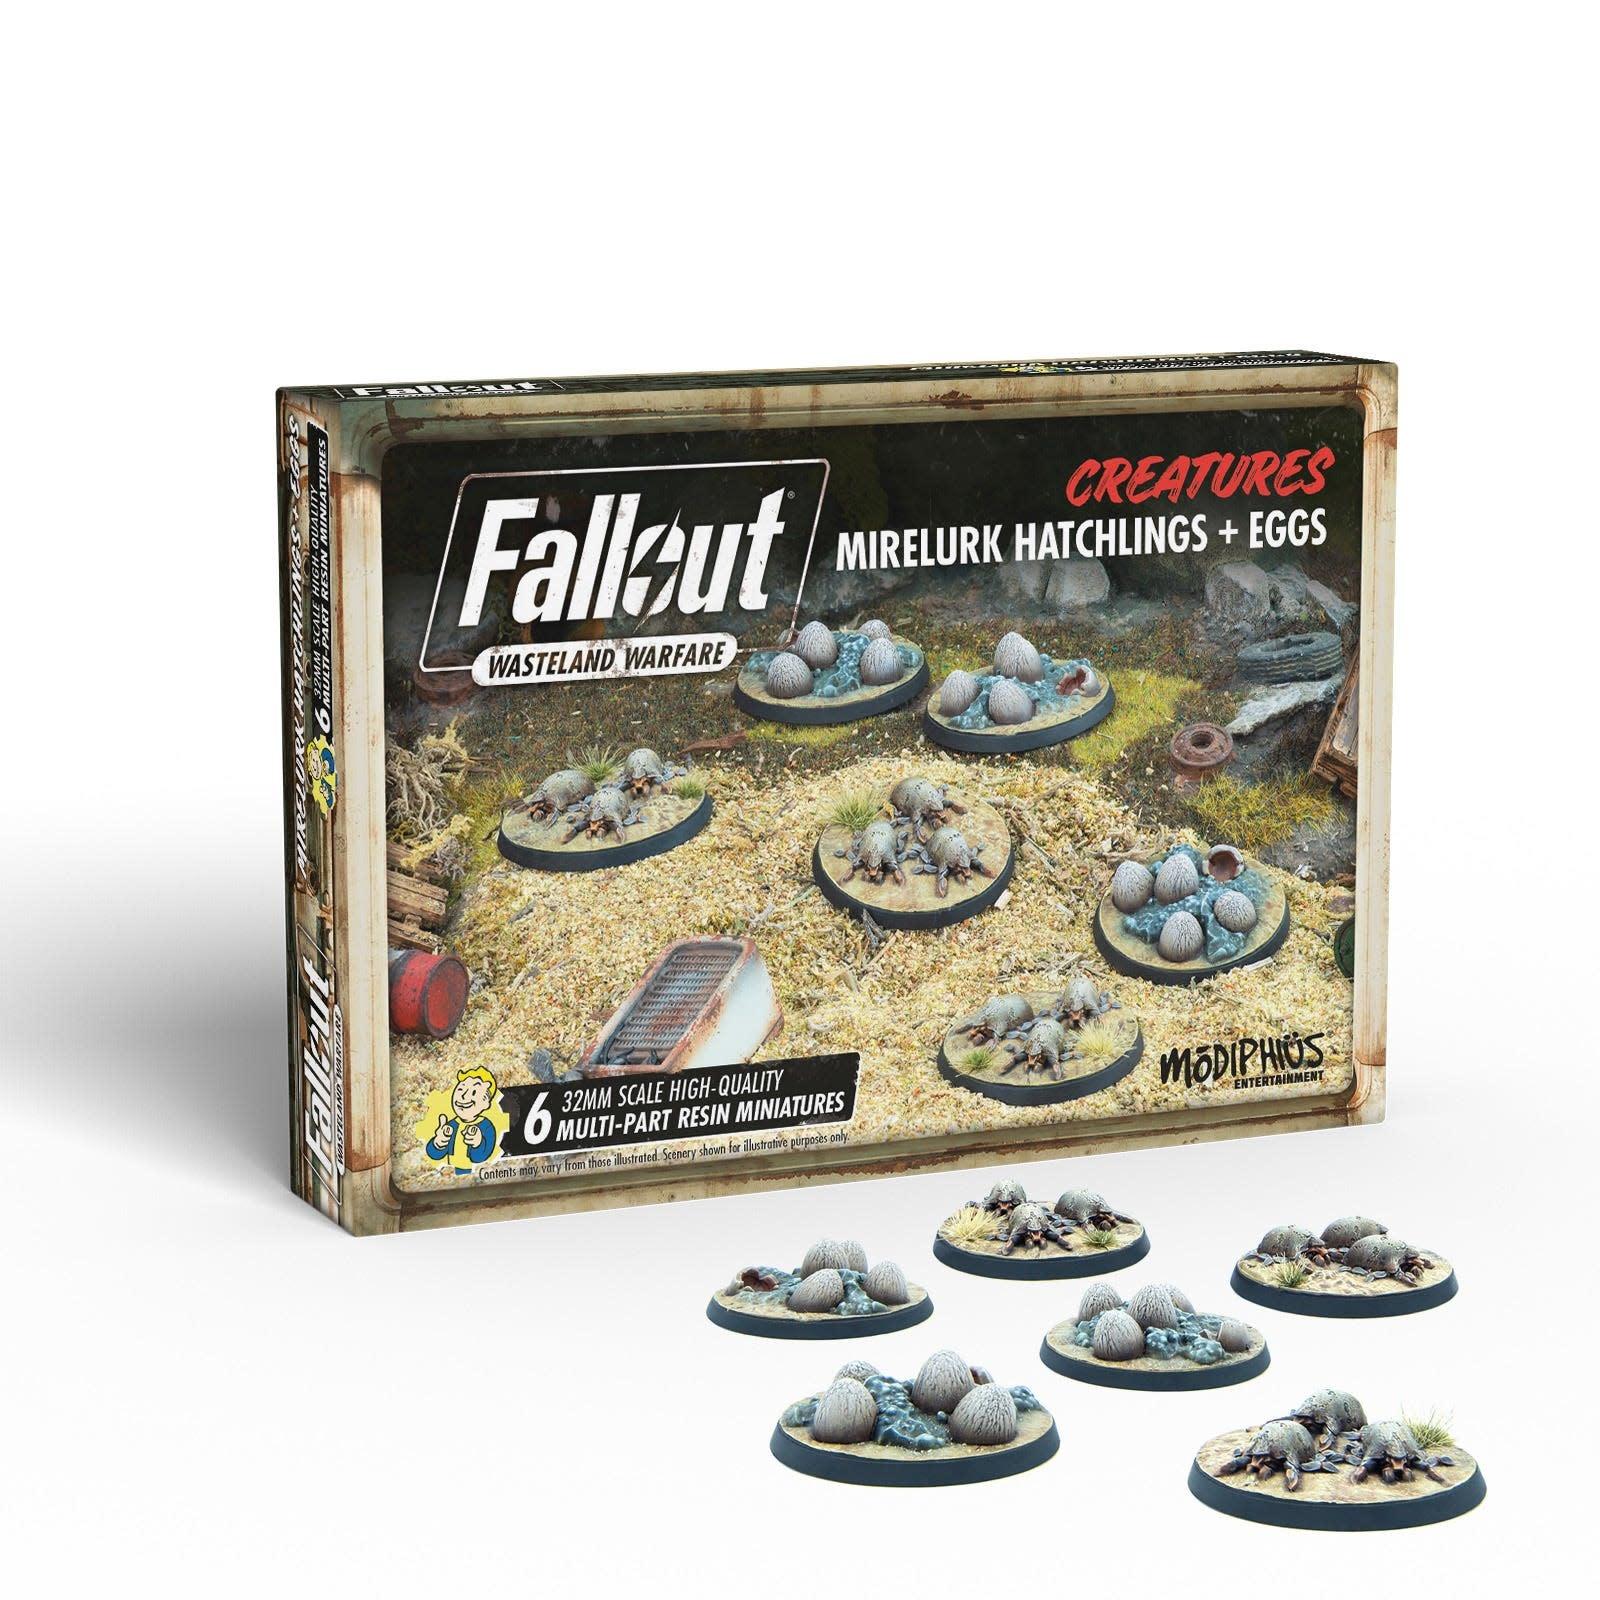 Modiphius Fallout Wasteland Warfare: Creatures- Mirelurk Hatchlings + eggs